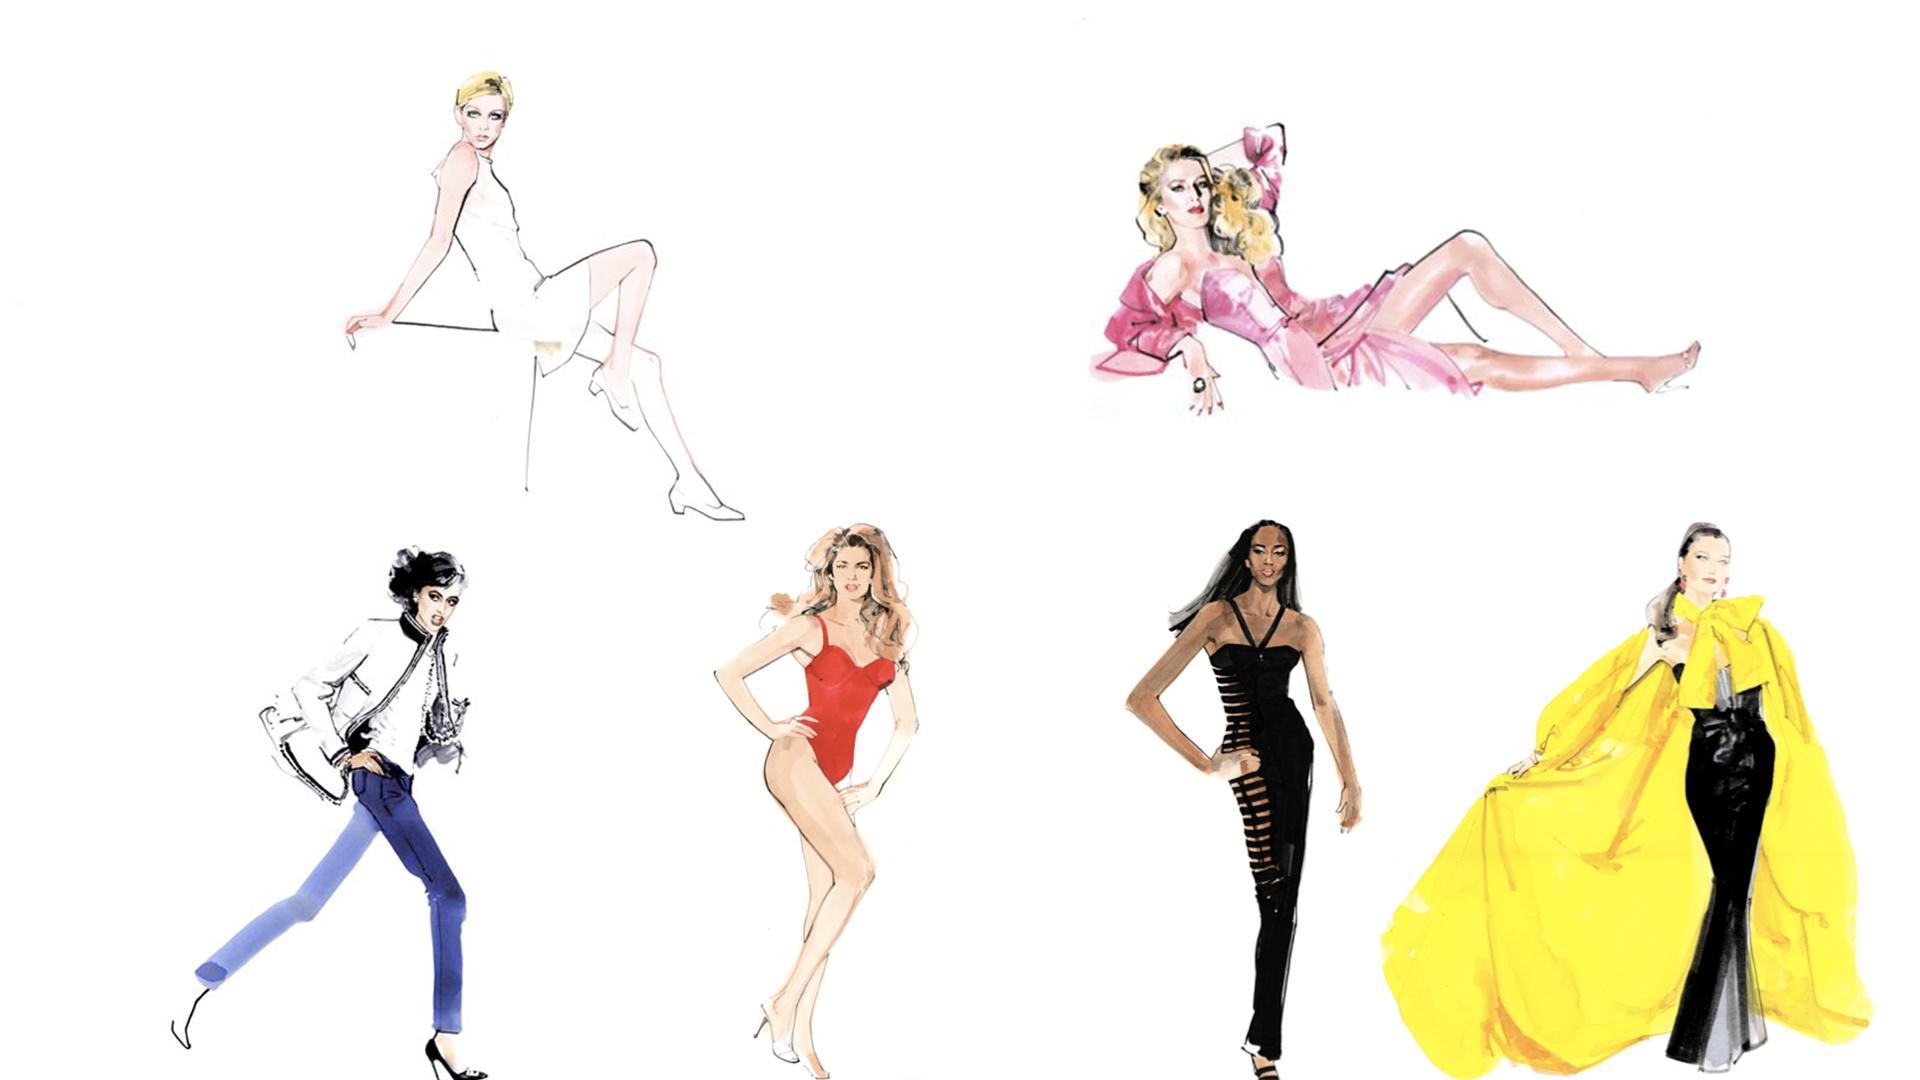 «POP MODELS» Diffusion Arte le samedi 27 septembre 2014 à 23h25